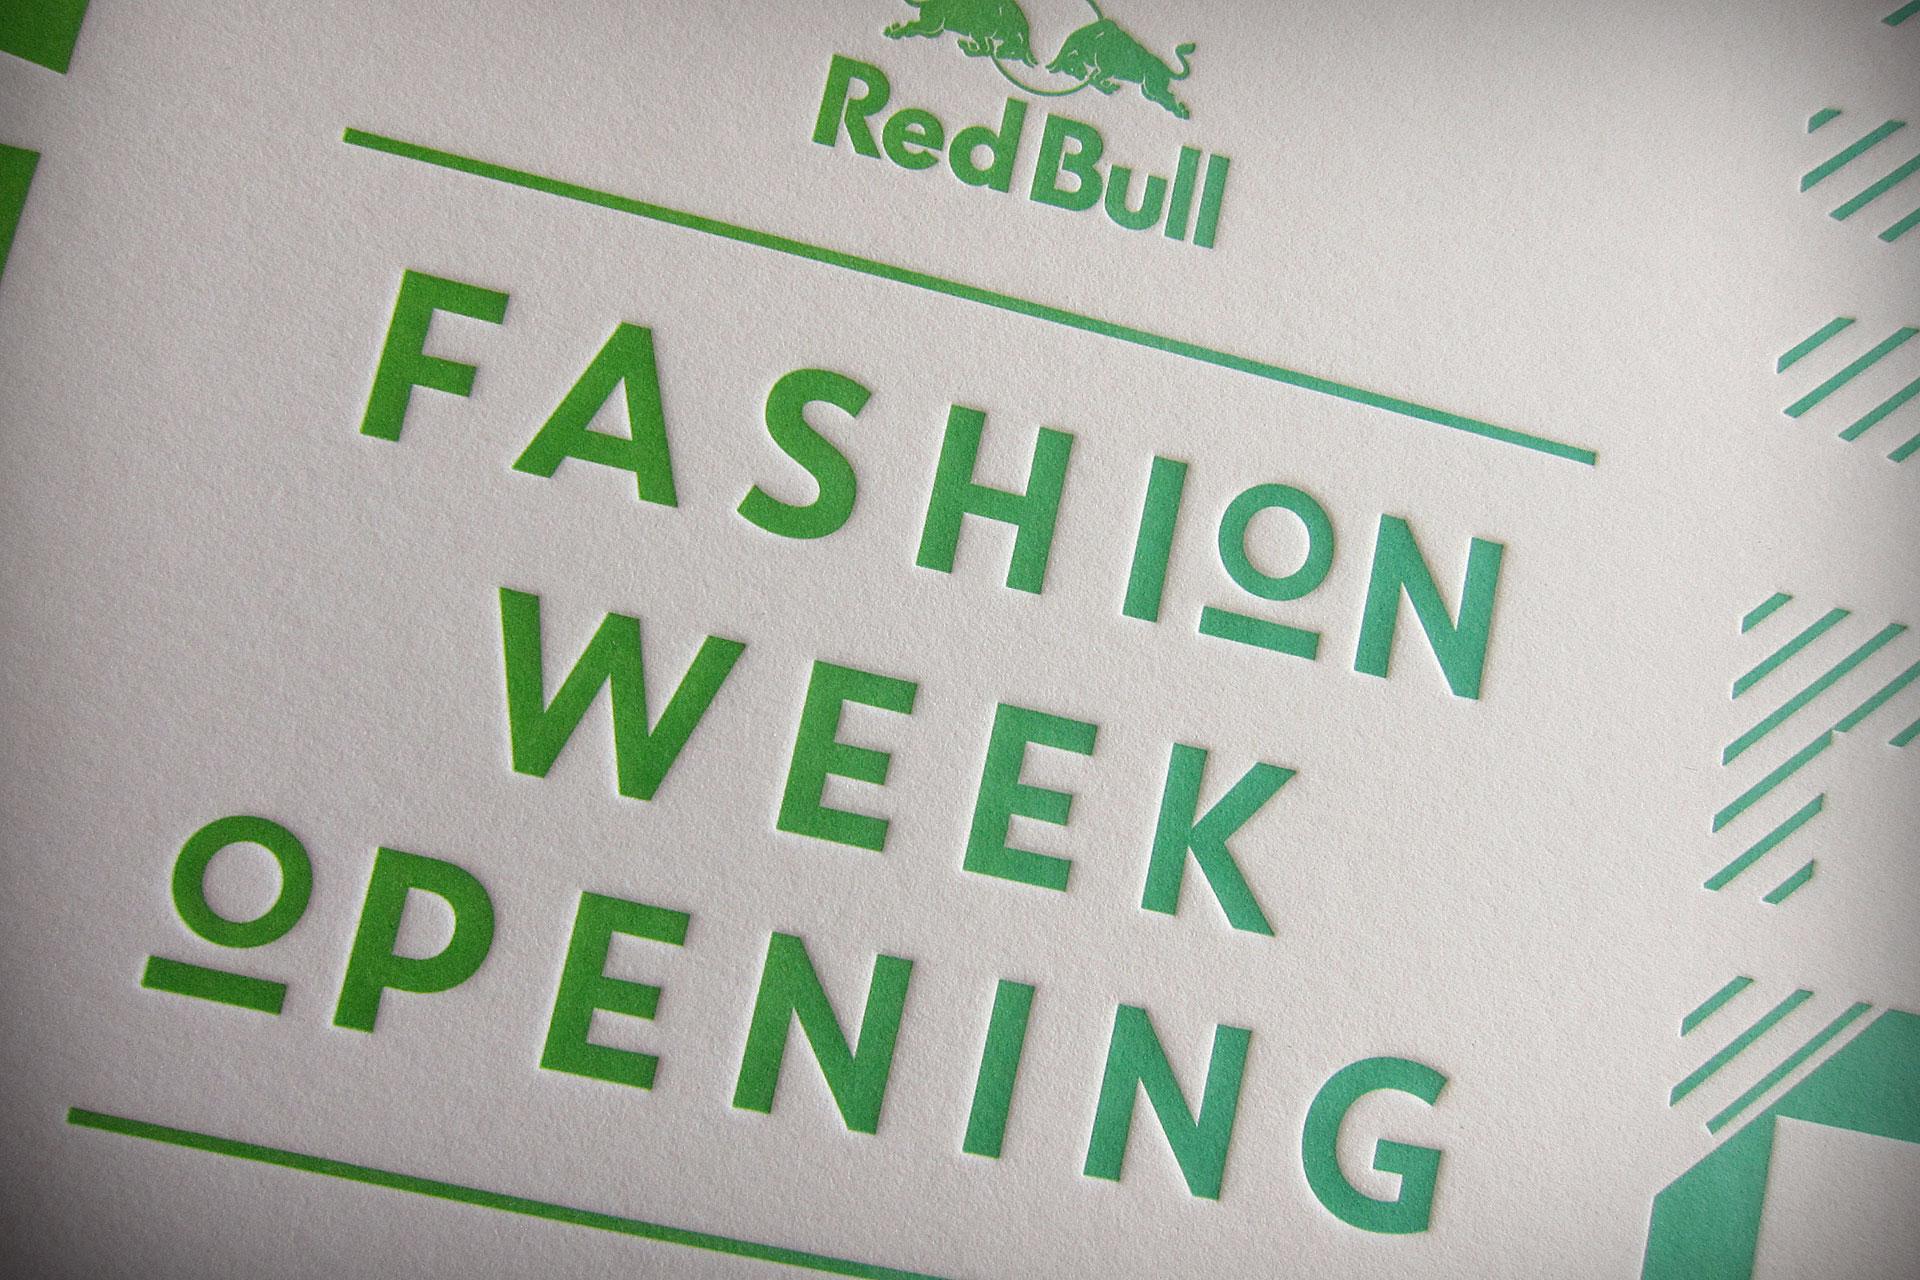 RedBull-FashionWeek-Karte